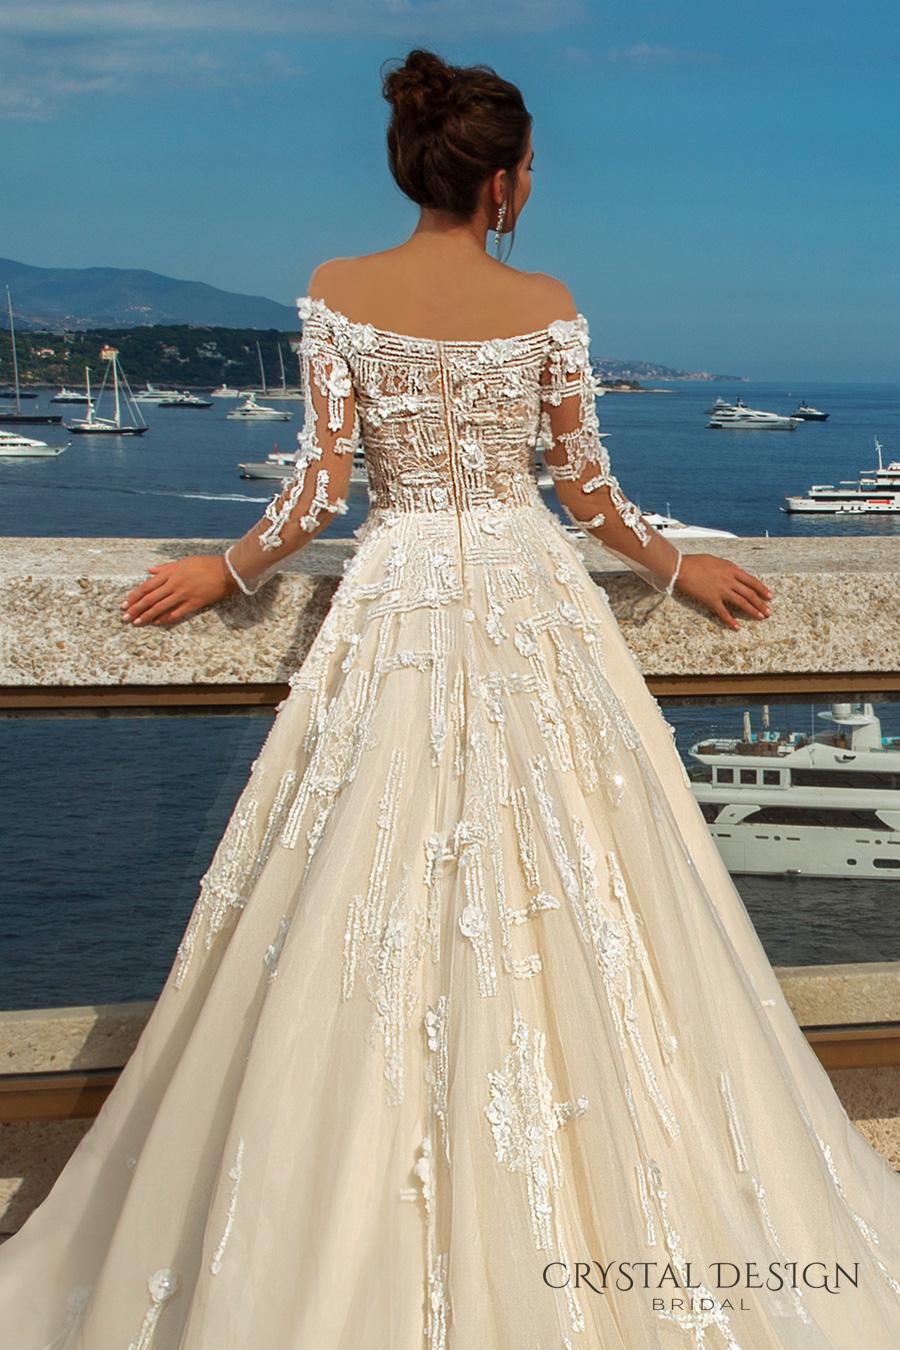 crystal design 2017 bridal long sleeves off the shoulder heavily embellished bodice romantic elegant ivory color a  line wedding dress lace back long train (brianne) zbv